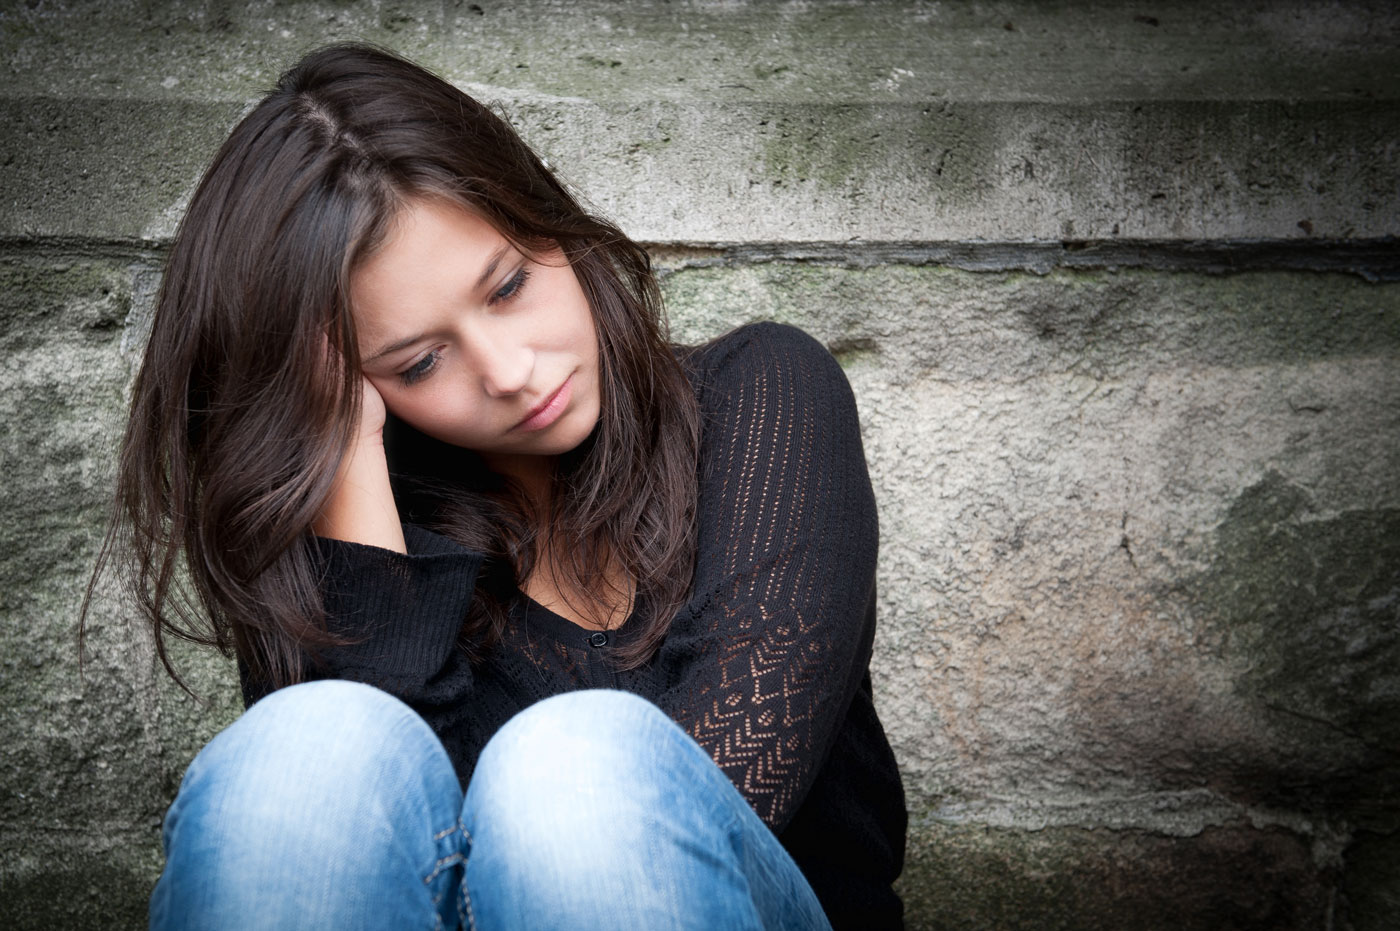 Depressed Woman - rexburg wellness center